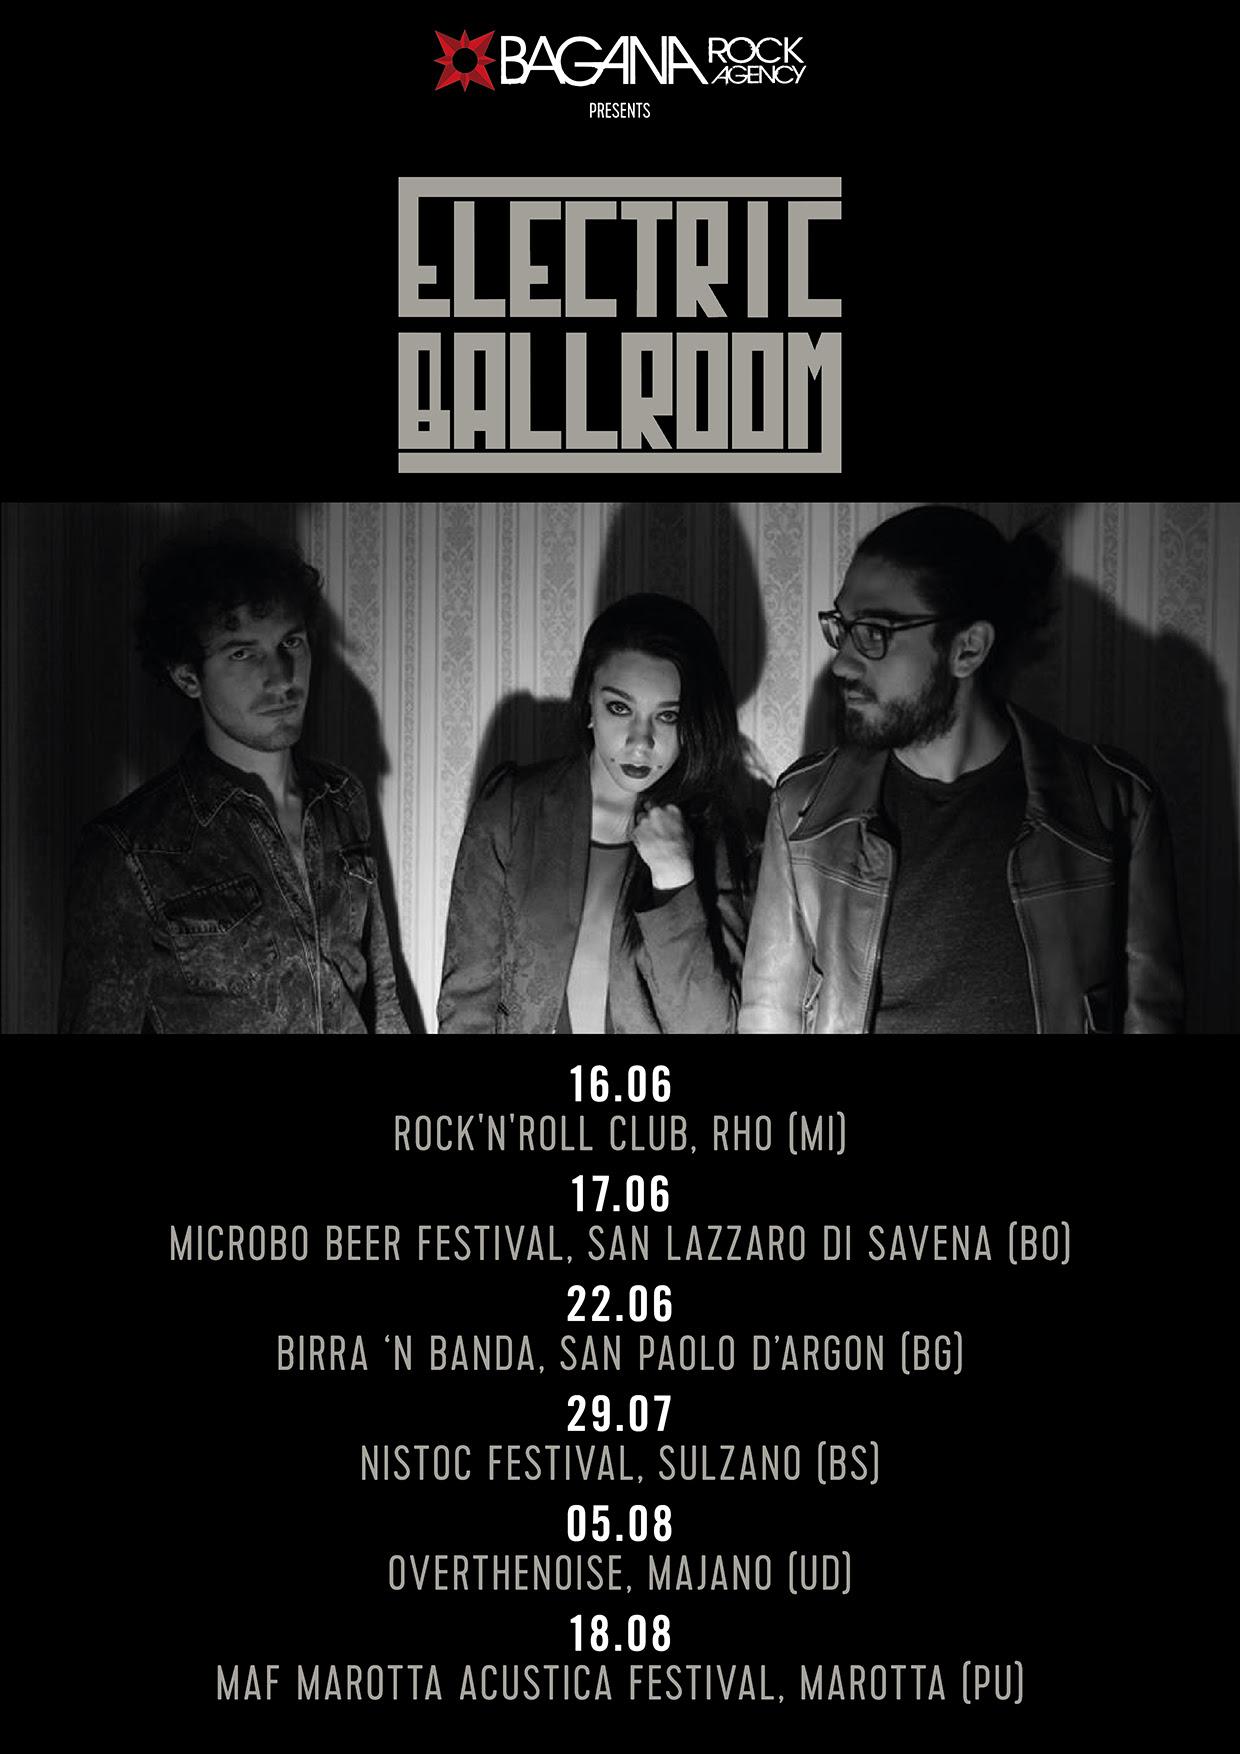 Electric Ballroom - Tour 2017 - Promo